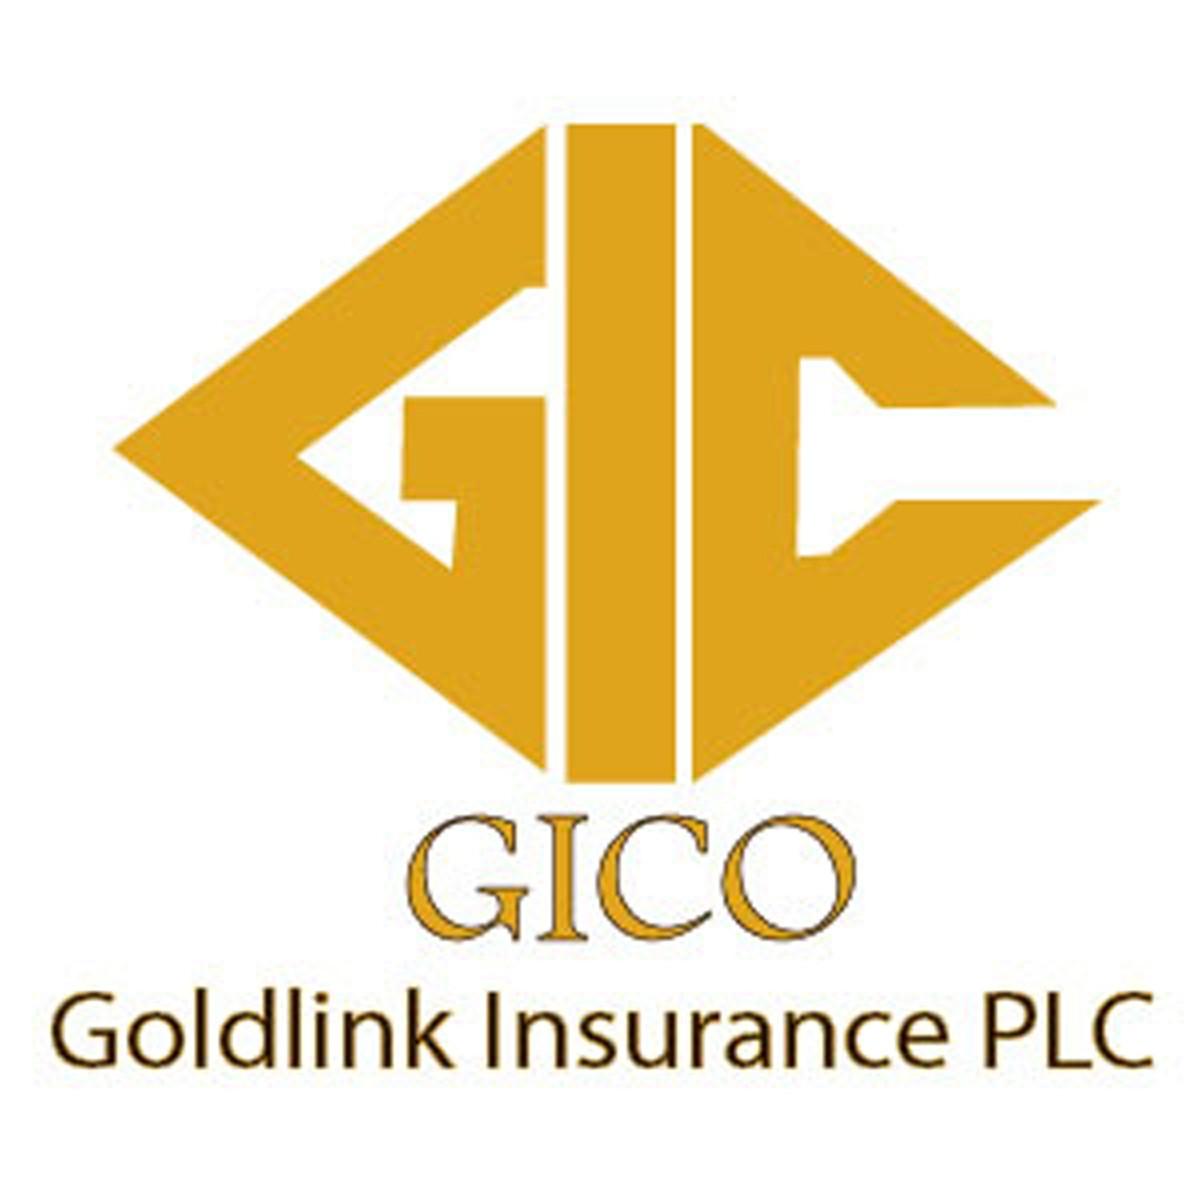 1600x1200_goldlink_0.5